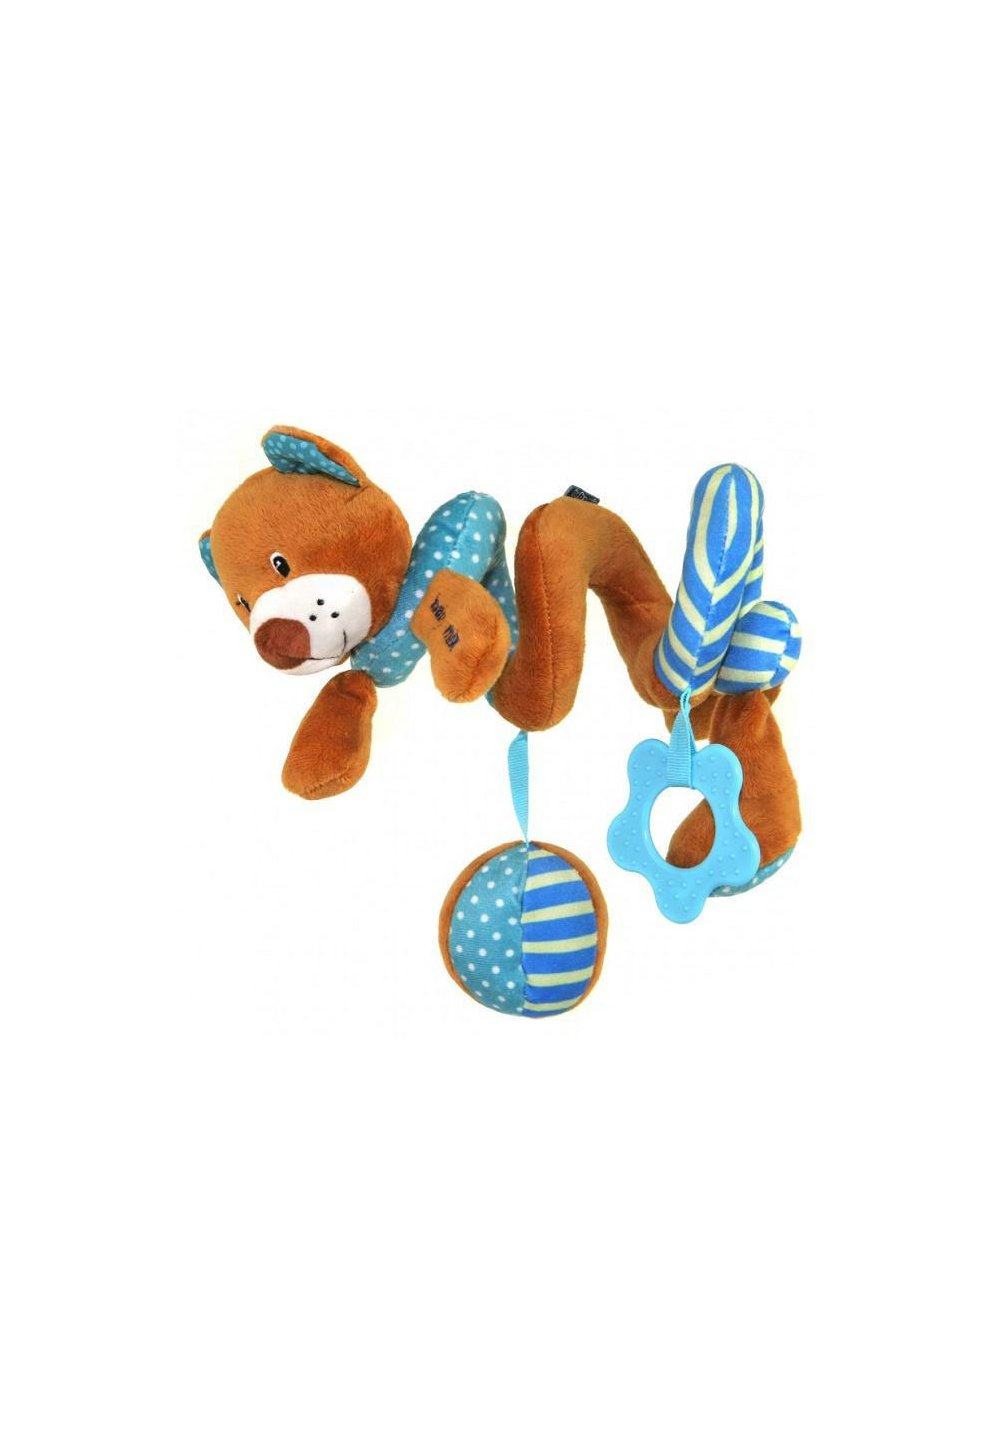 Jucarie pentru carucior spirala, ursulet, albastru